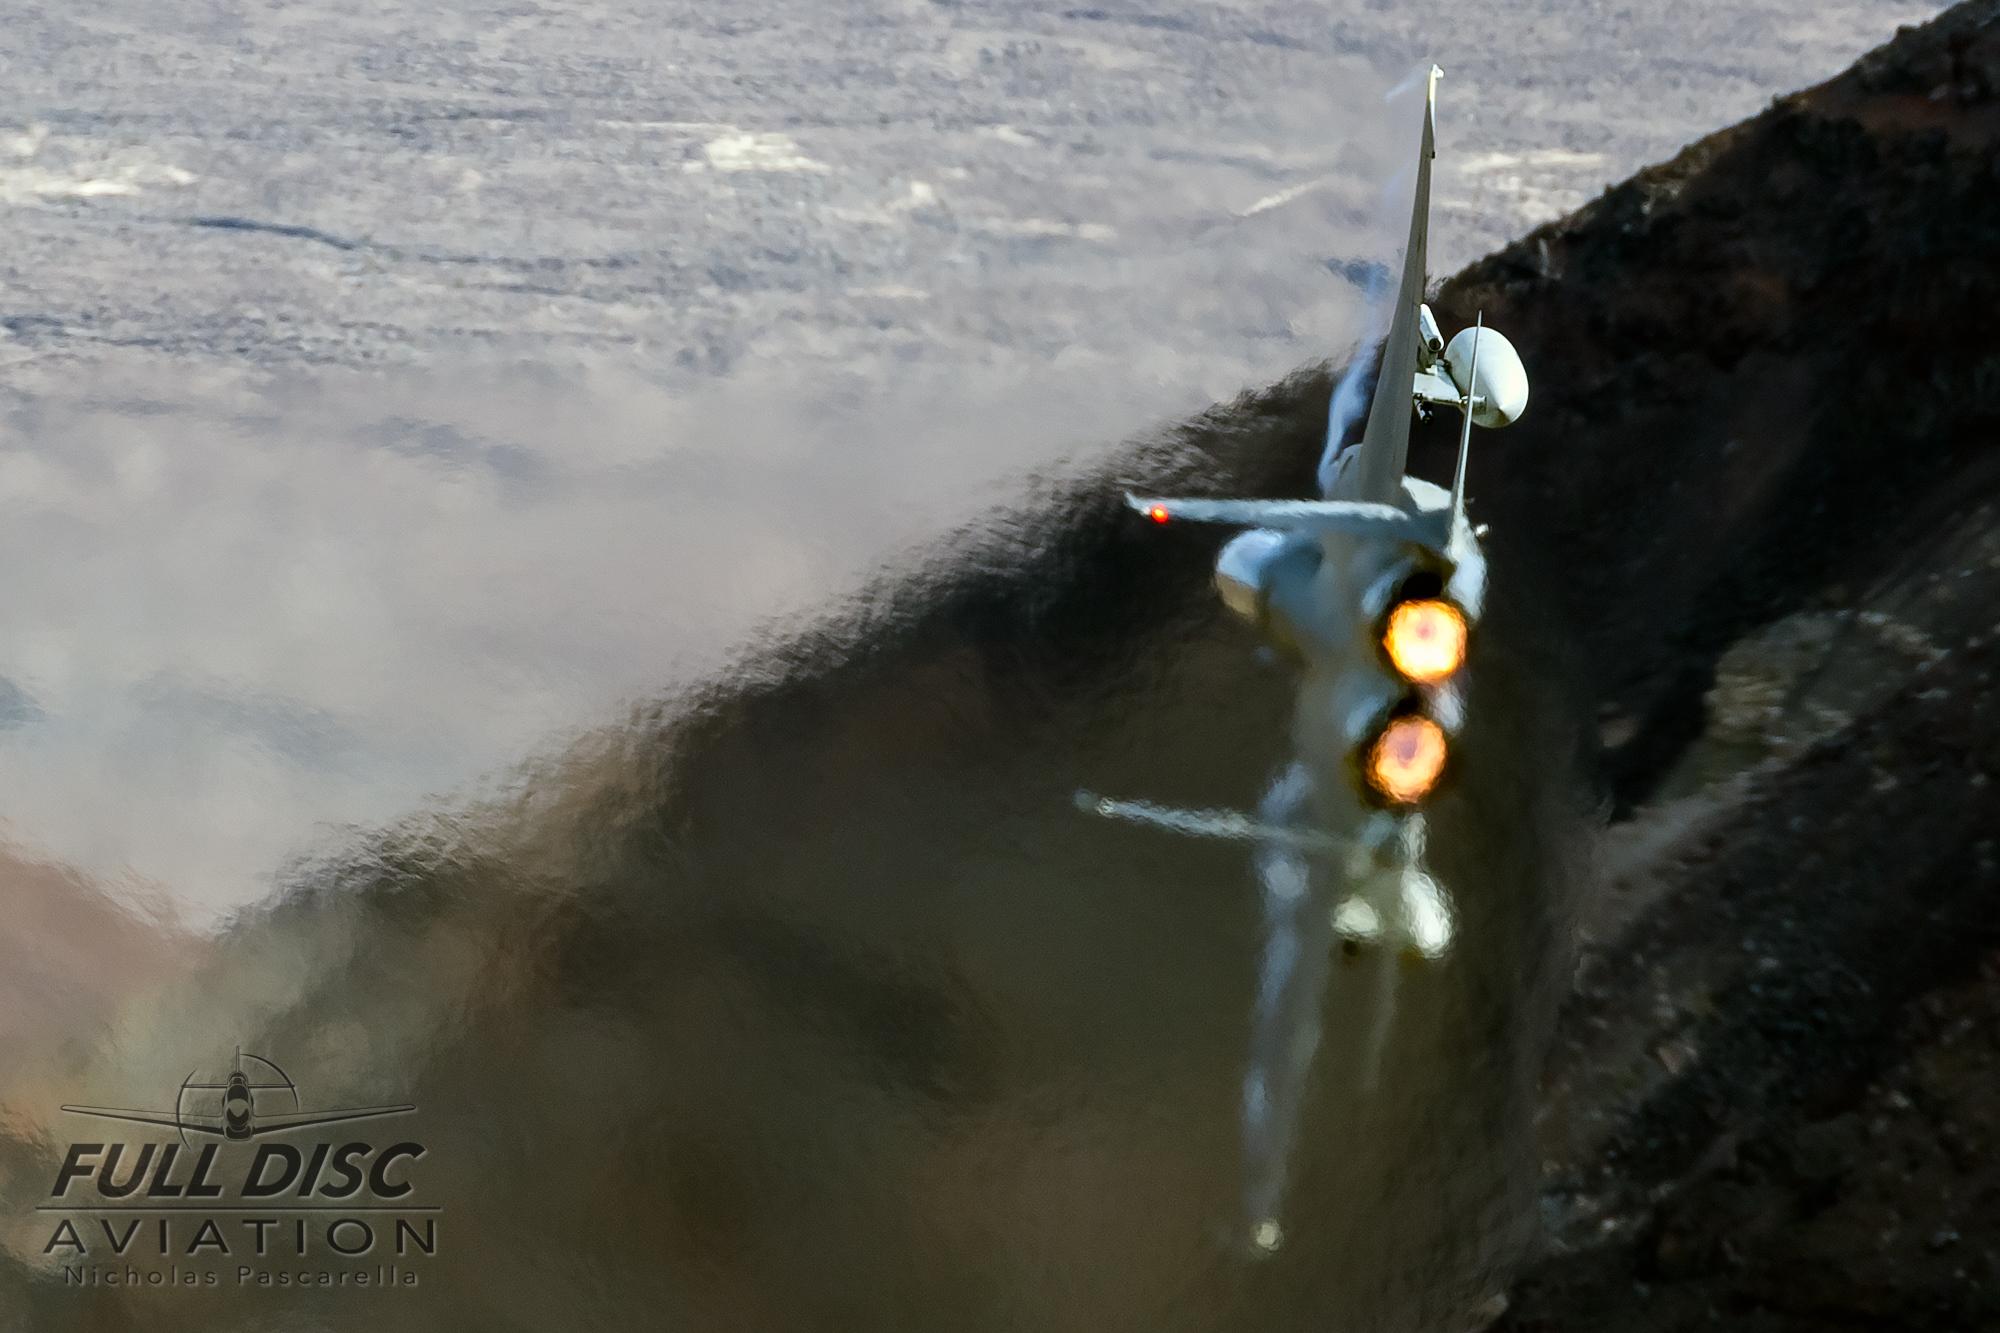 nickpascarella_nicholaspascarella_fulldiscaviation_aircraft_f15_afterburners_jeditransition_starwarscanyon_rainbowcanyon.jpg